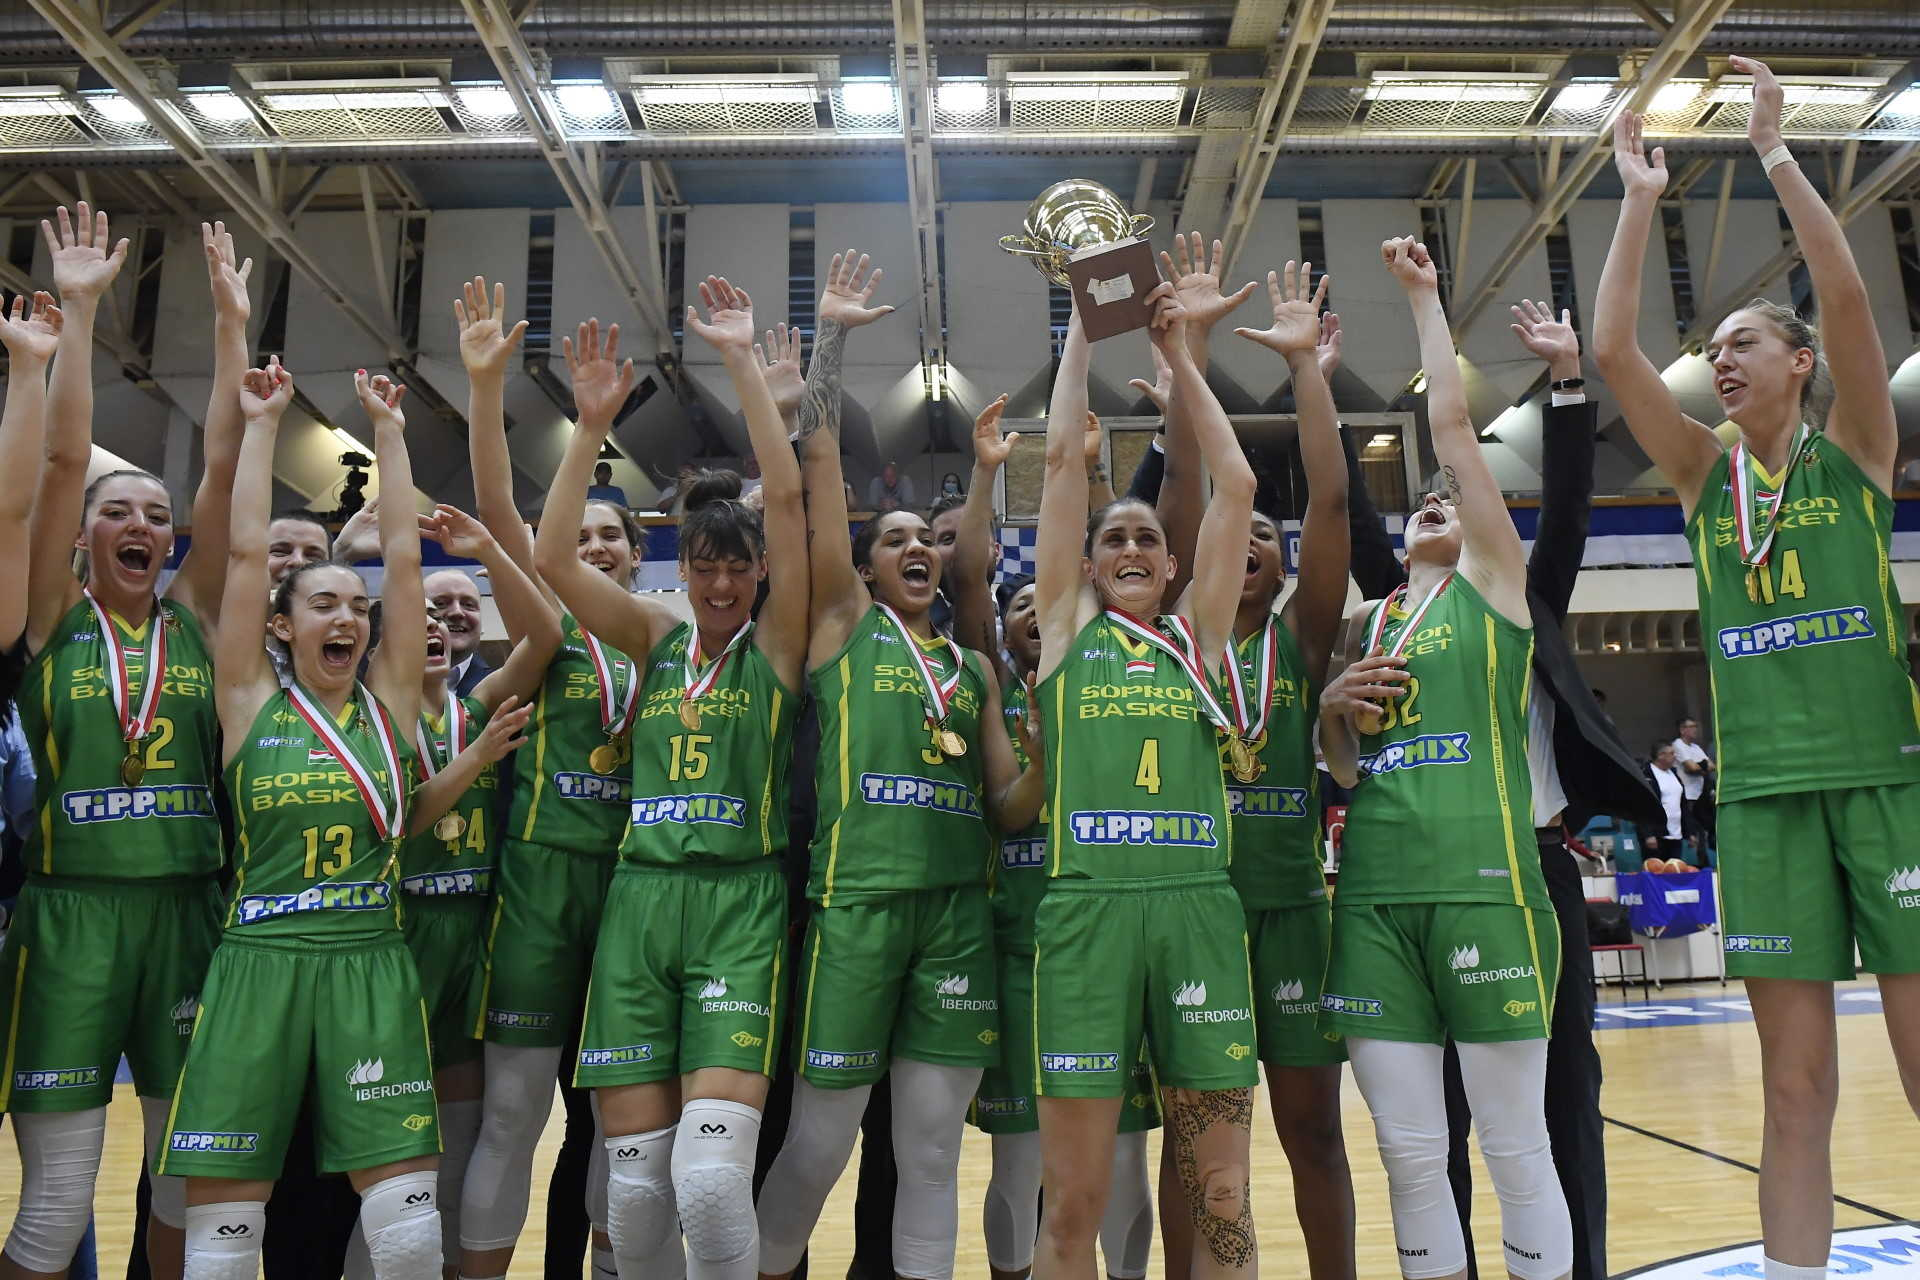 14-edszer bajnok a Sopron Basket